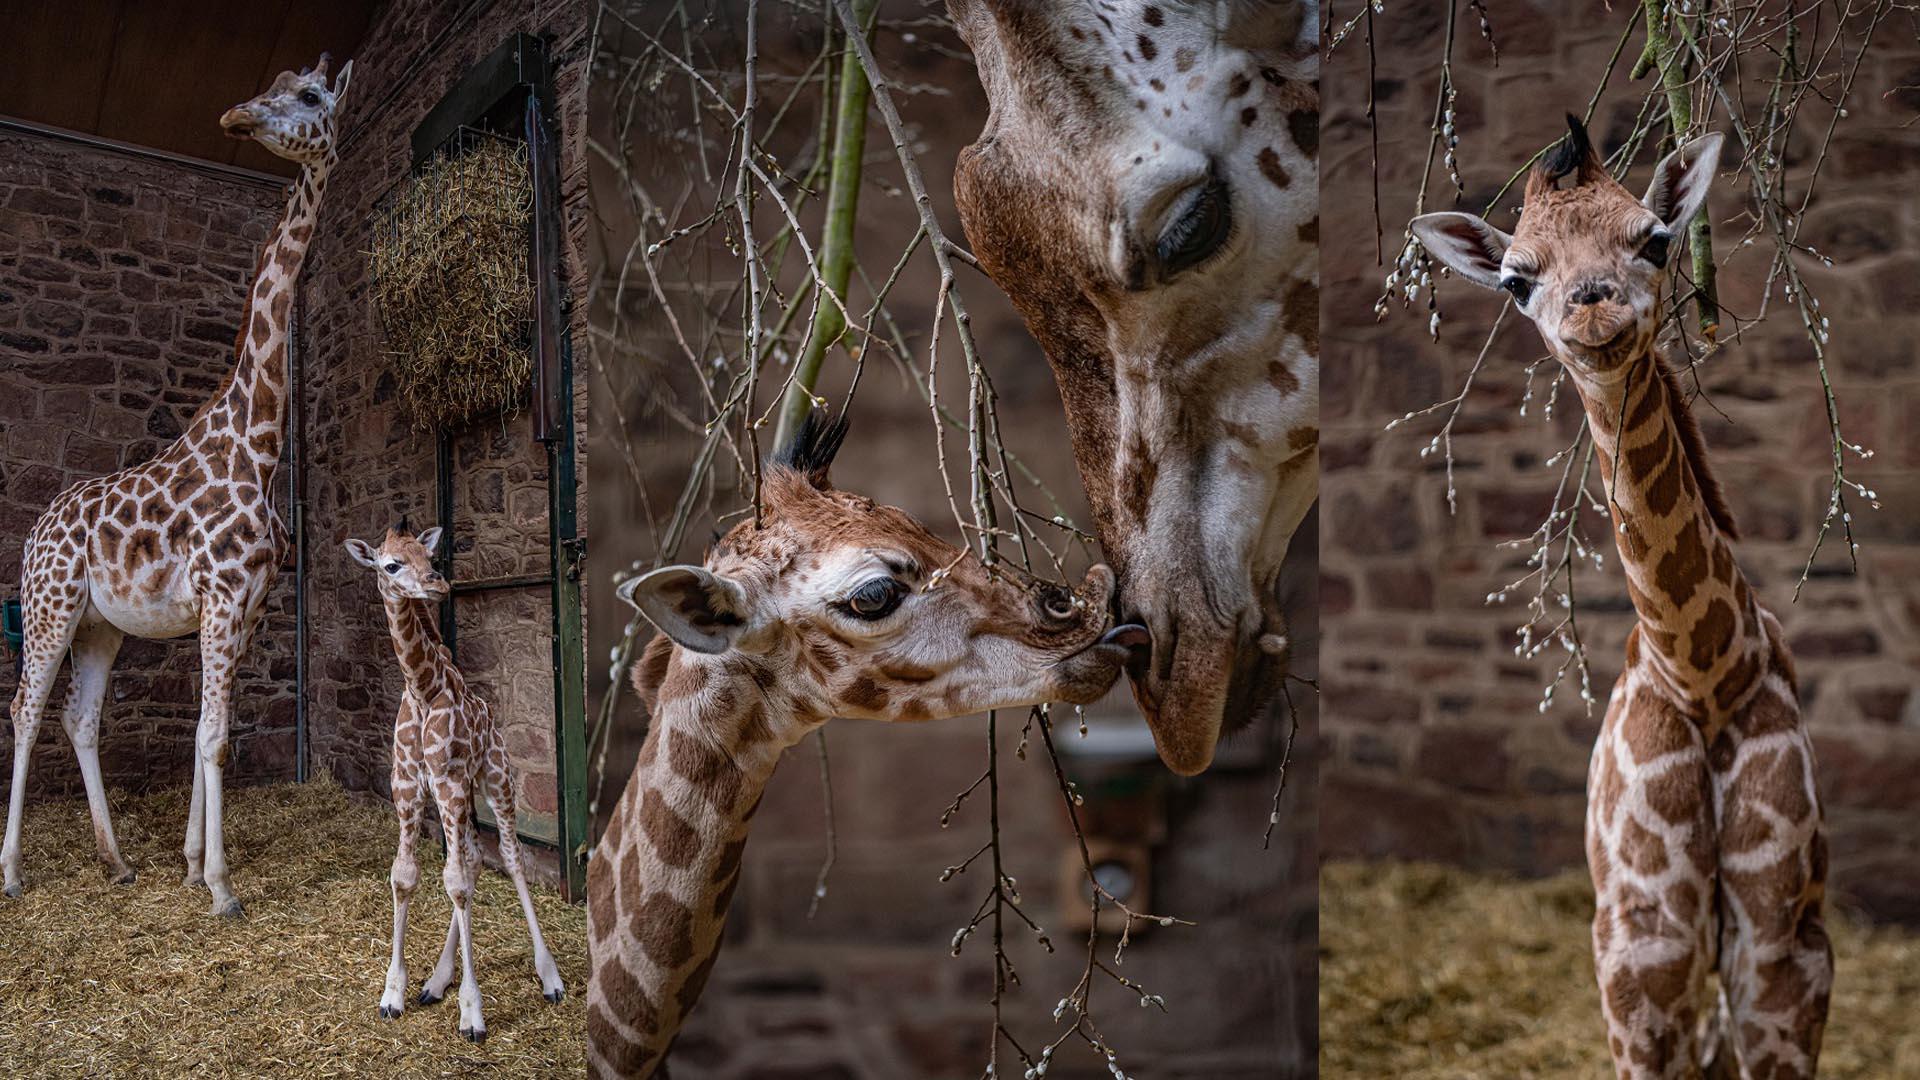 Cameras capture incredible moment rare giraffe is born at Chester Zoo